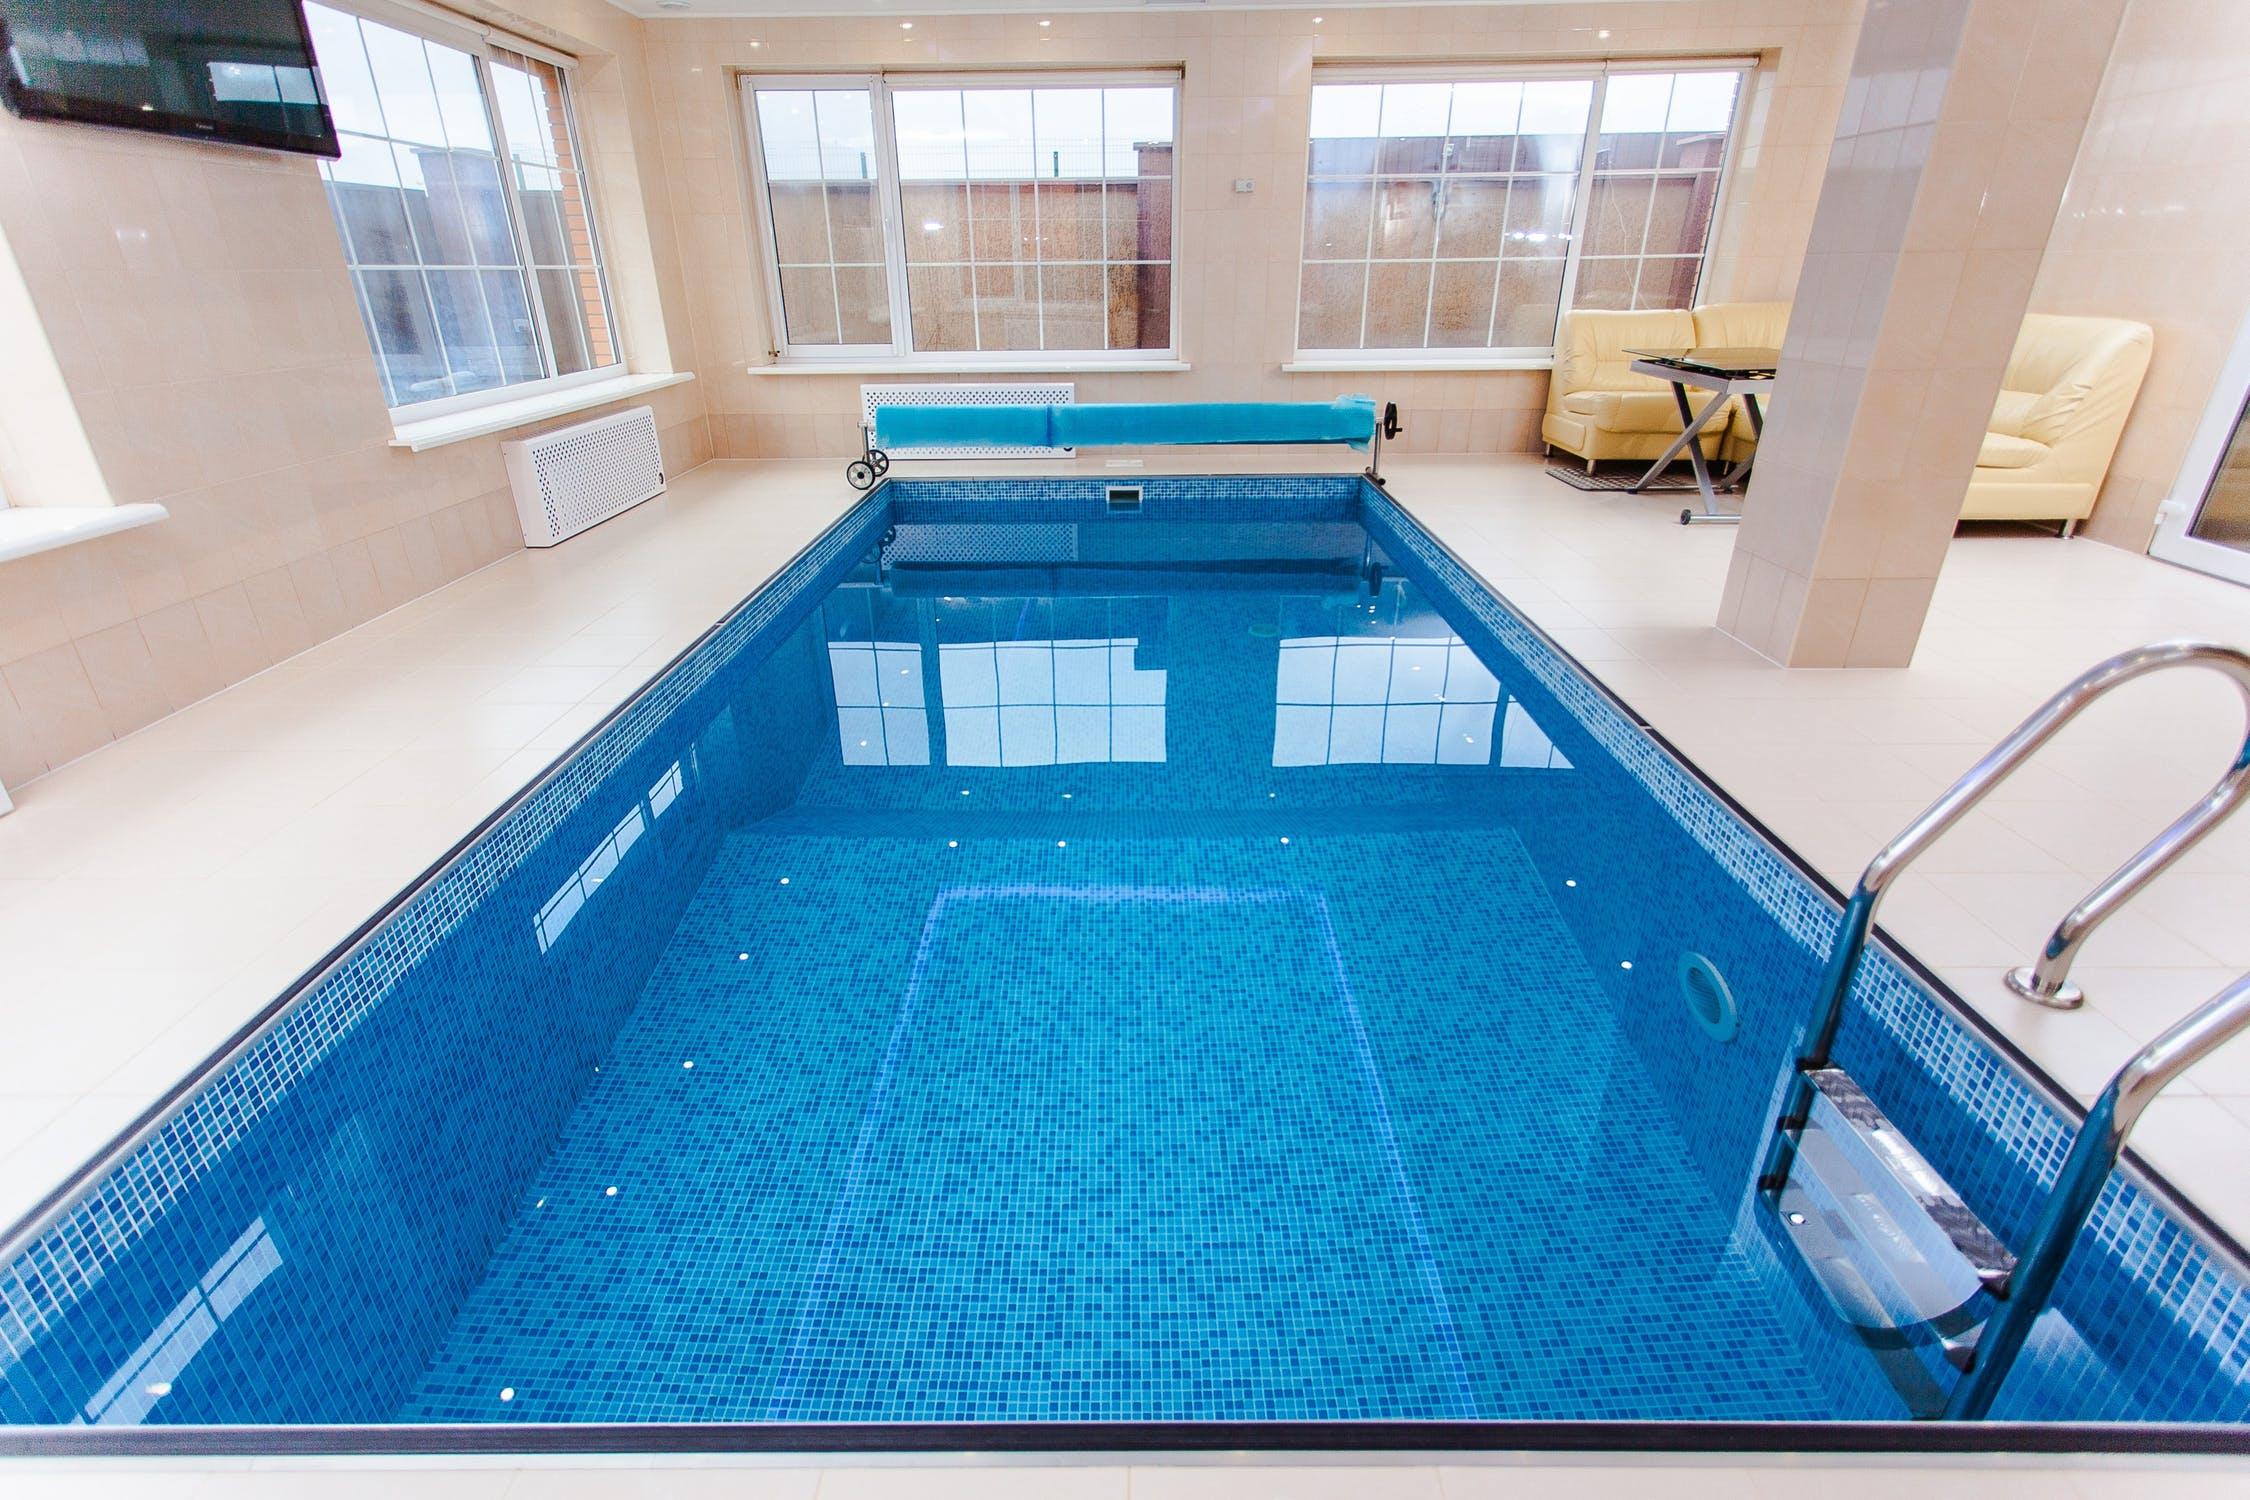 In indoor swimming pools - dehumidifiers